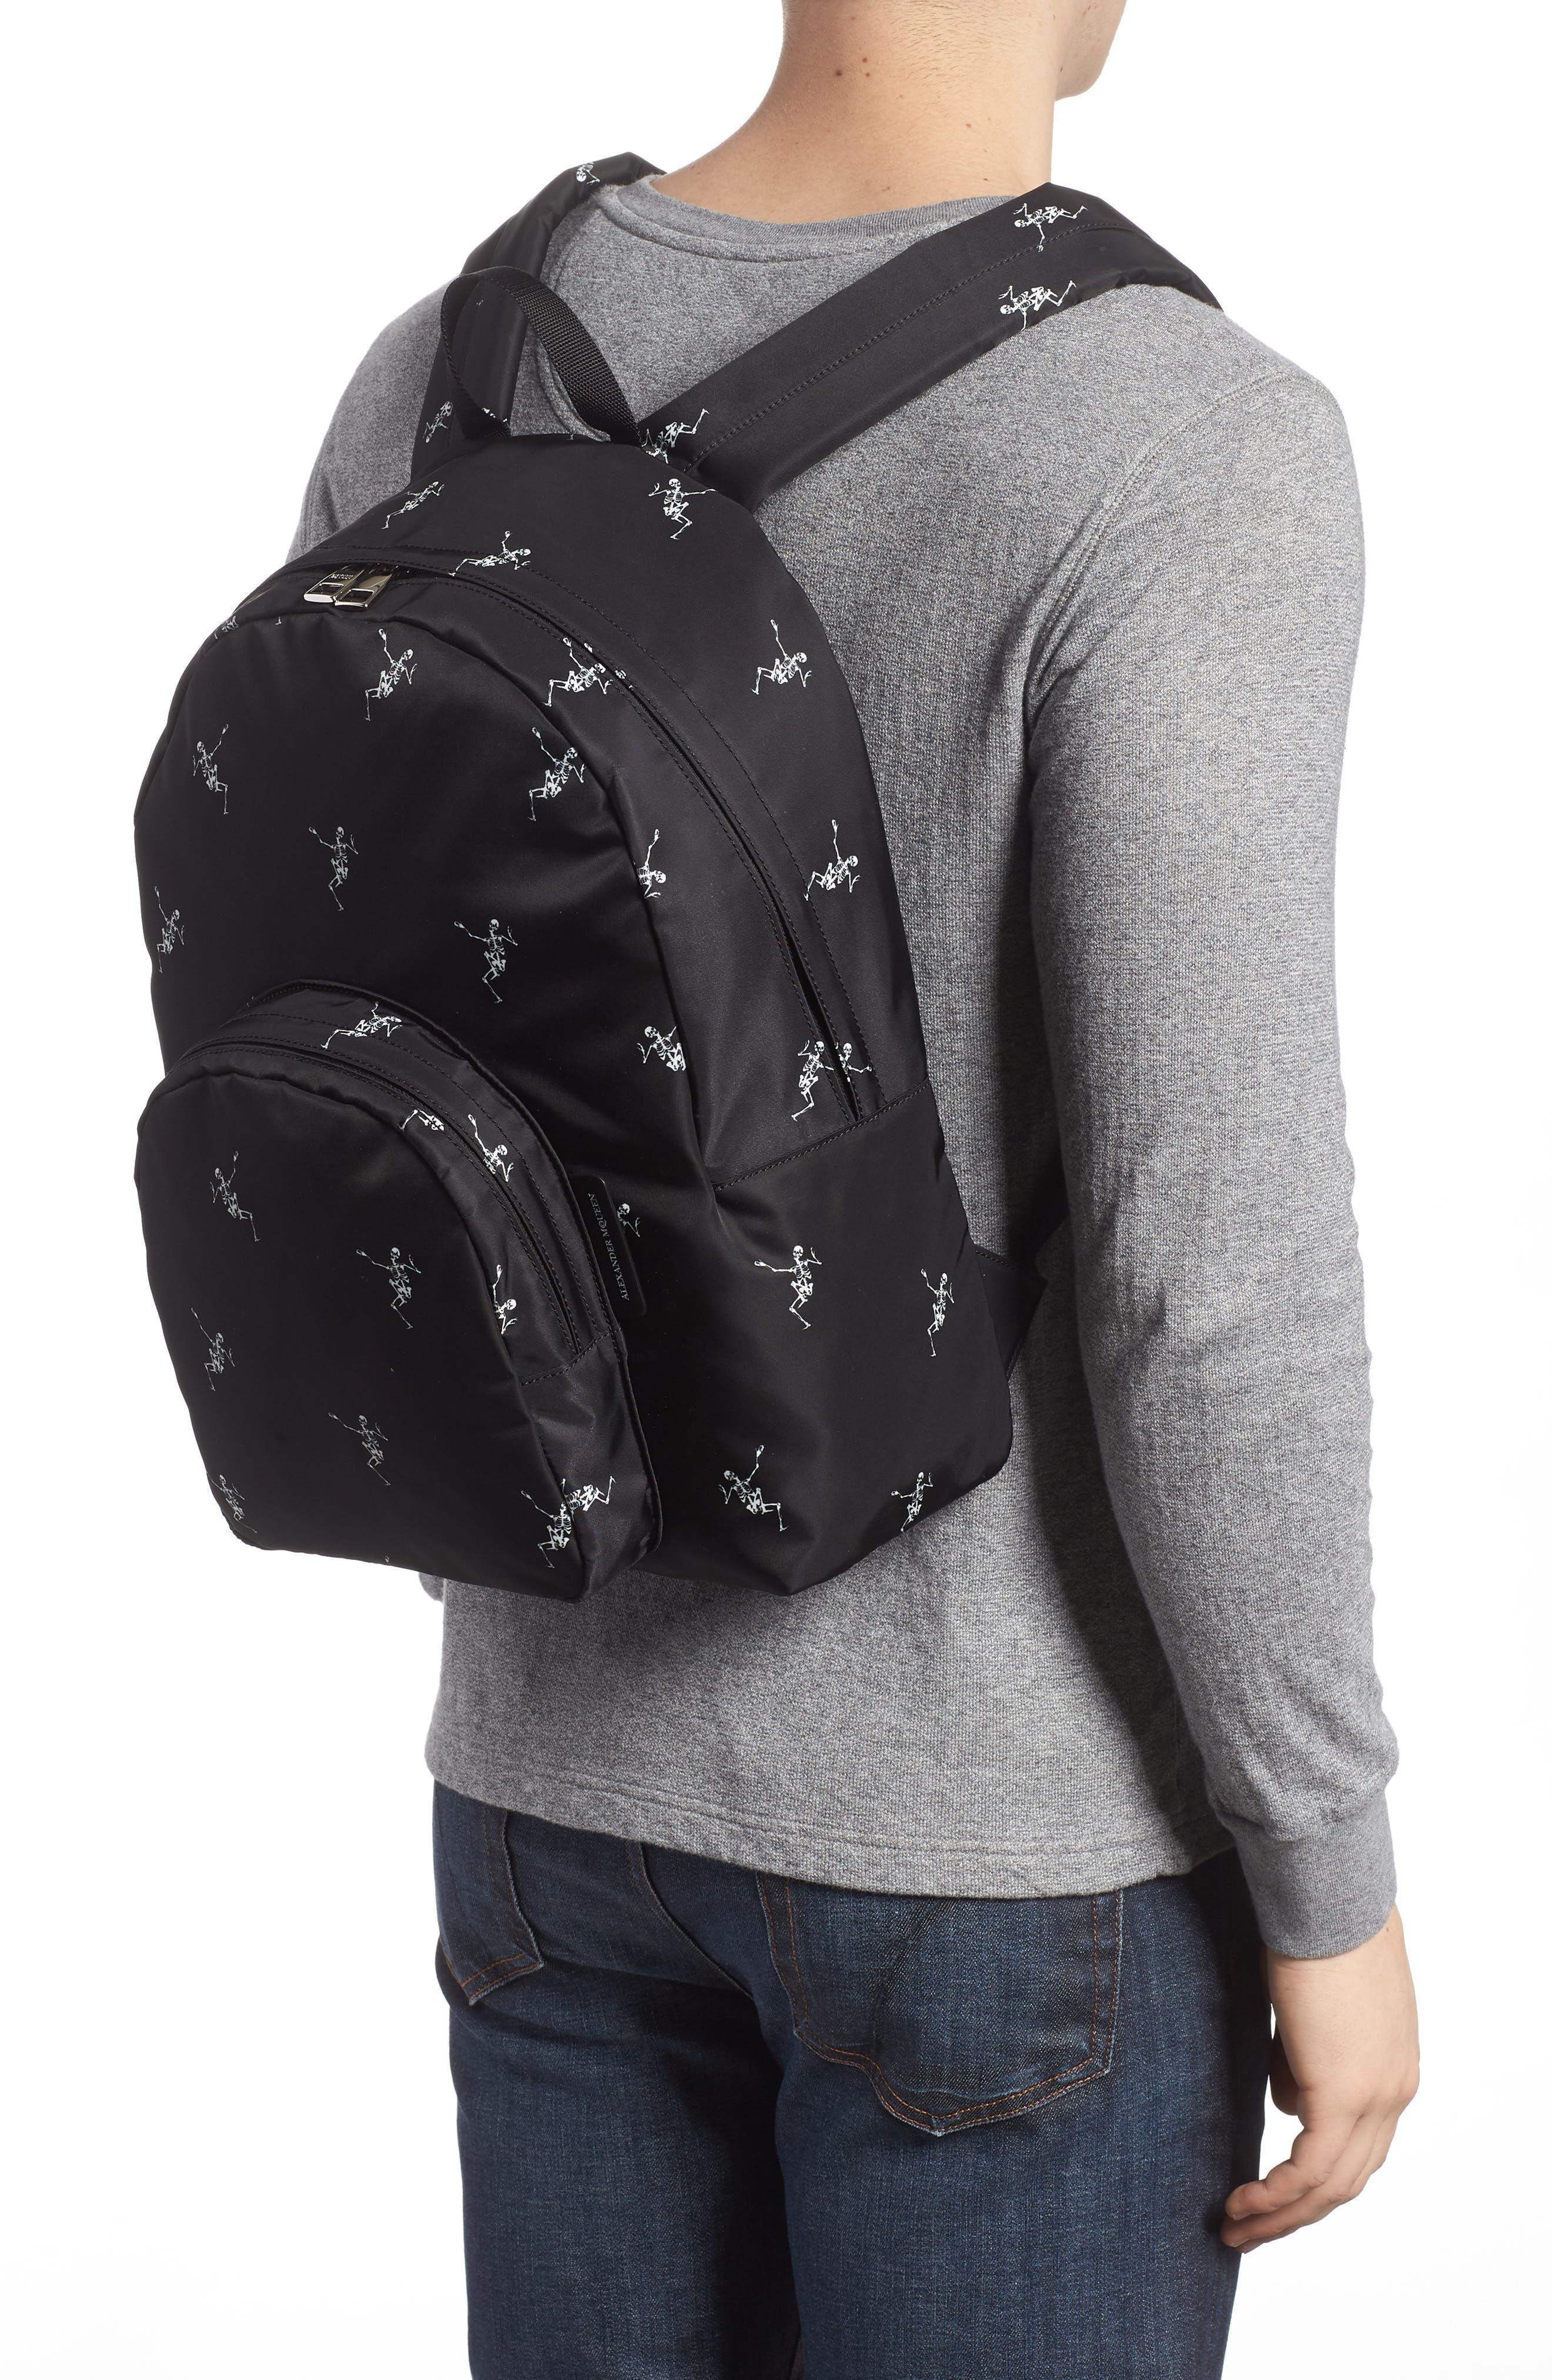 Dancing Skeleton Backpack,                             Alternate thumbnail 2, color,                             BLACK/ OFF WHITE